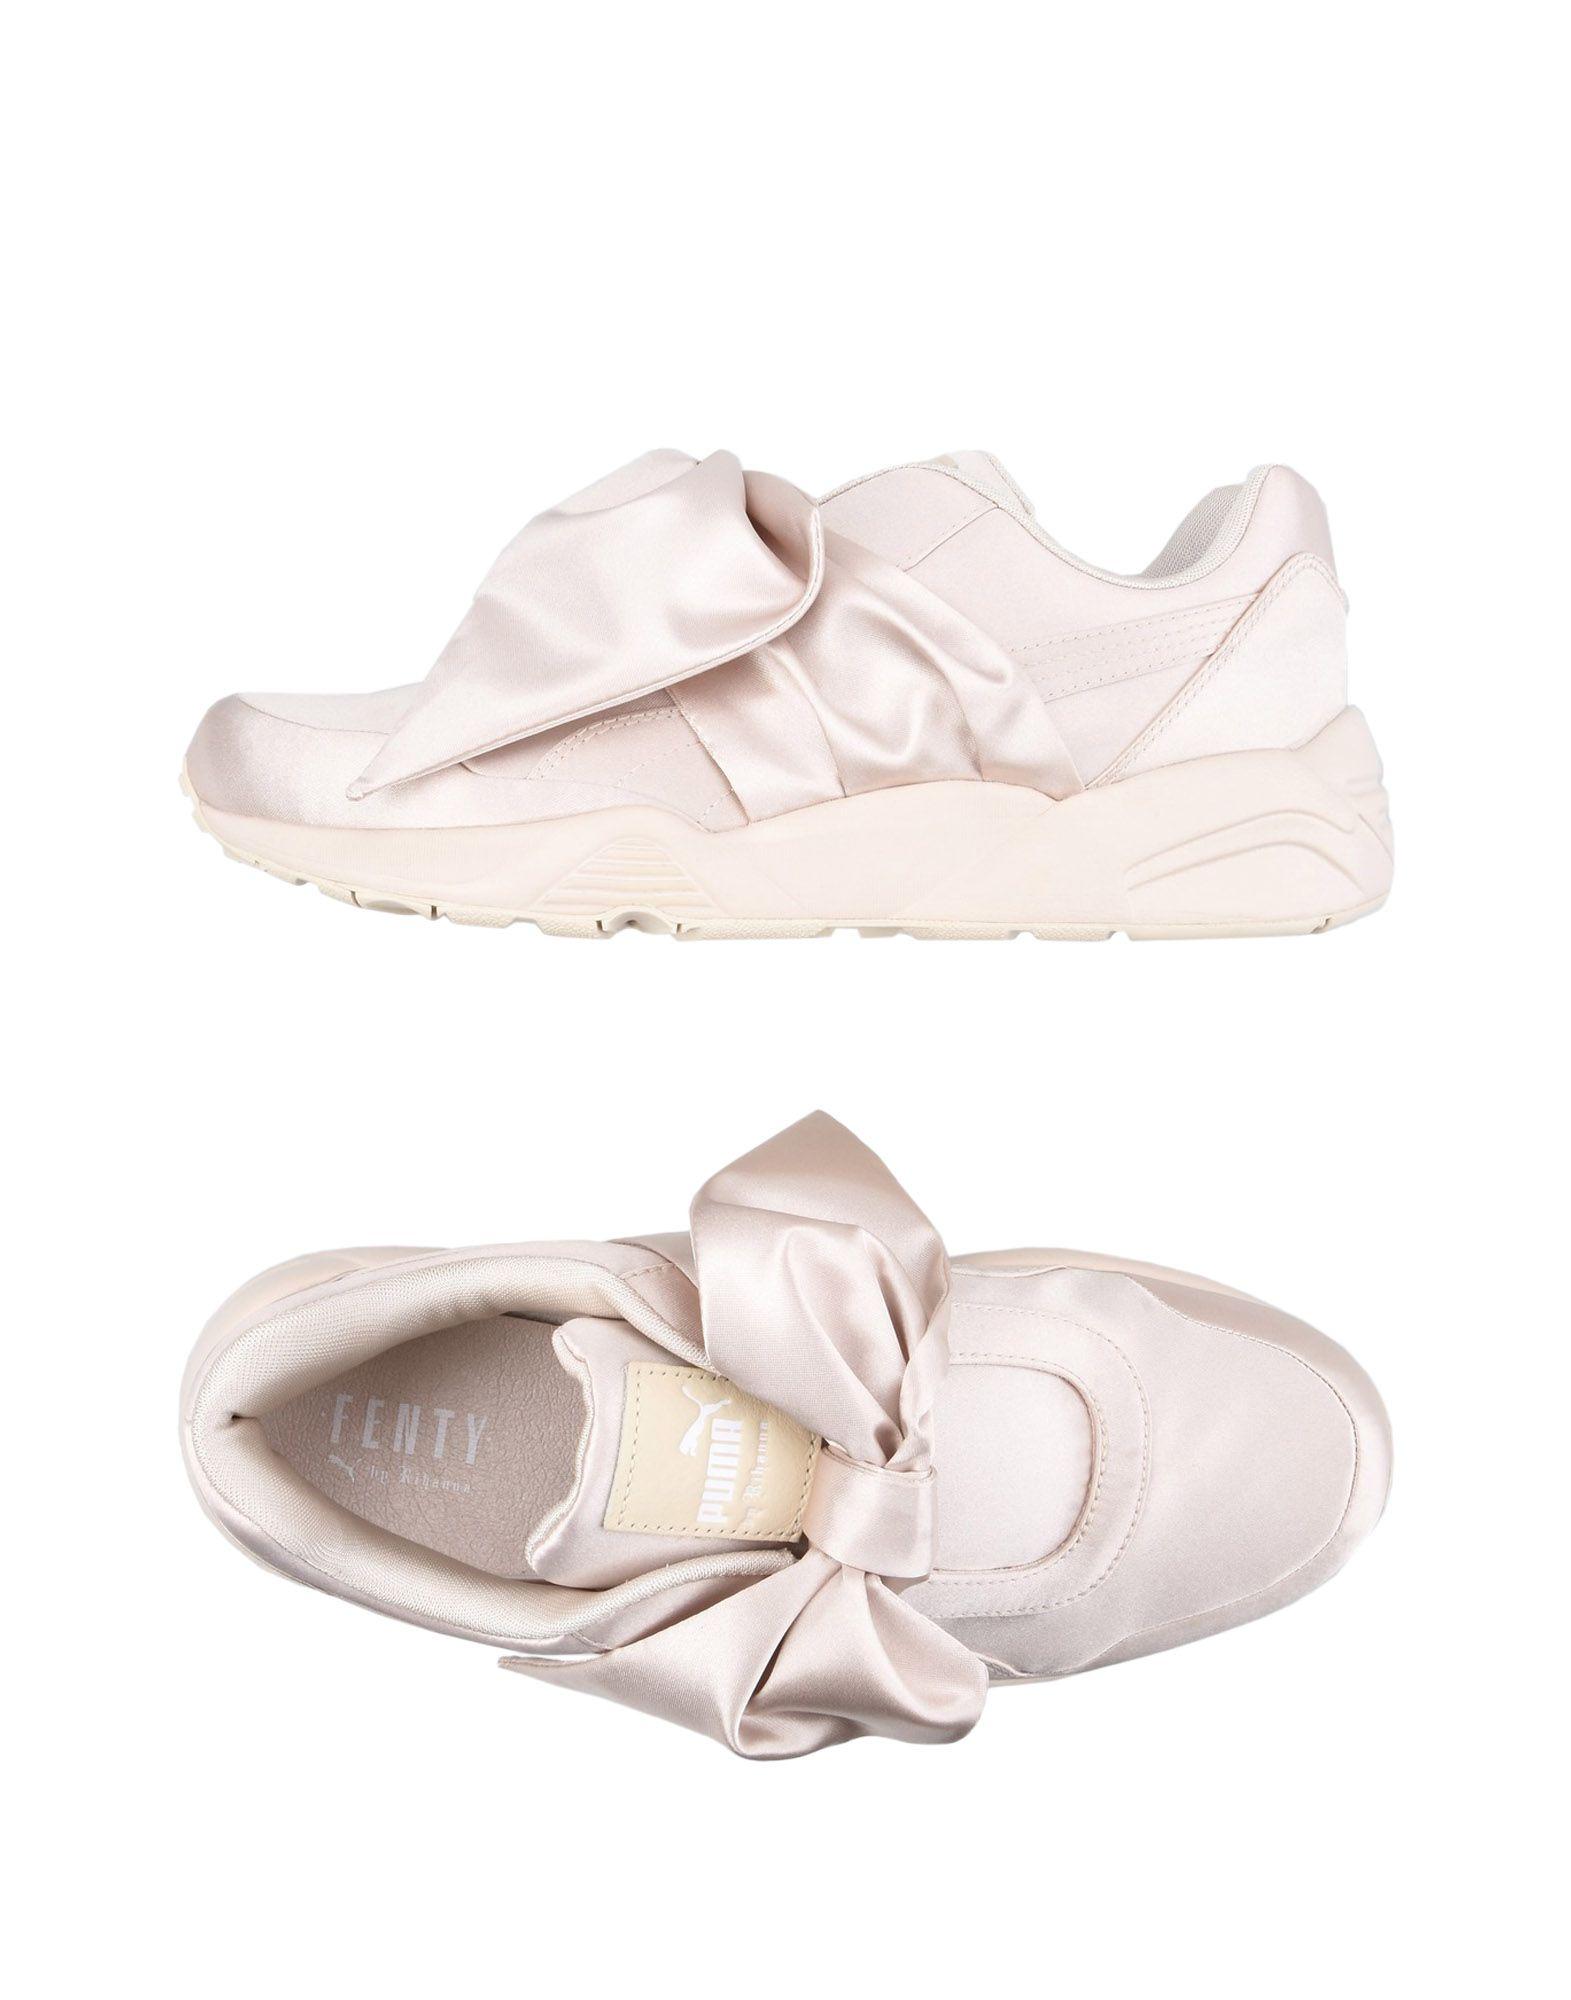 Sneakers Fenty Puma By Rihanna Trinomic Bandana - Donna - Acquista online su